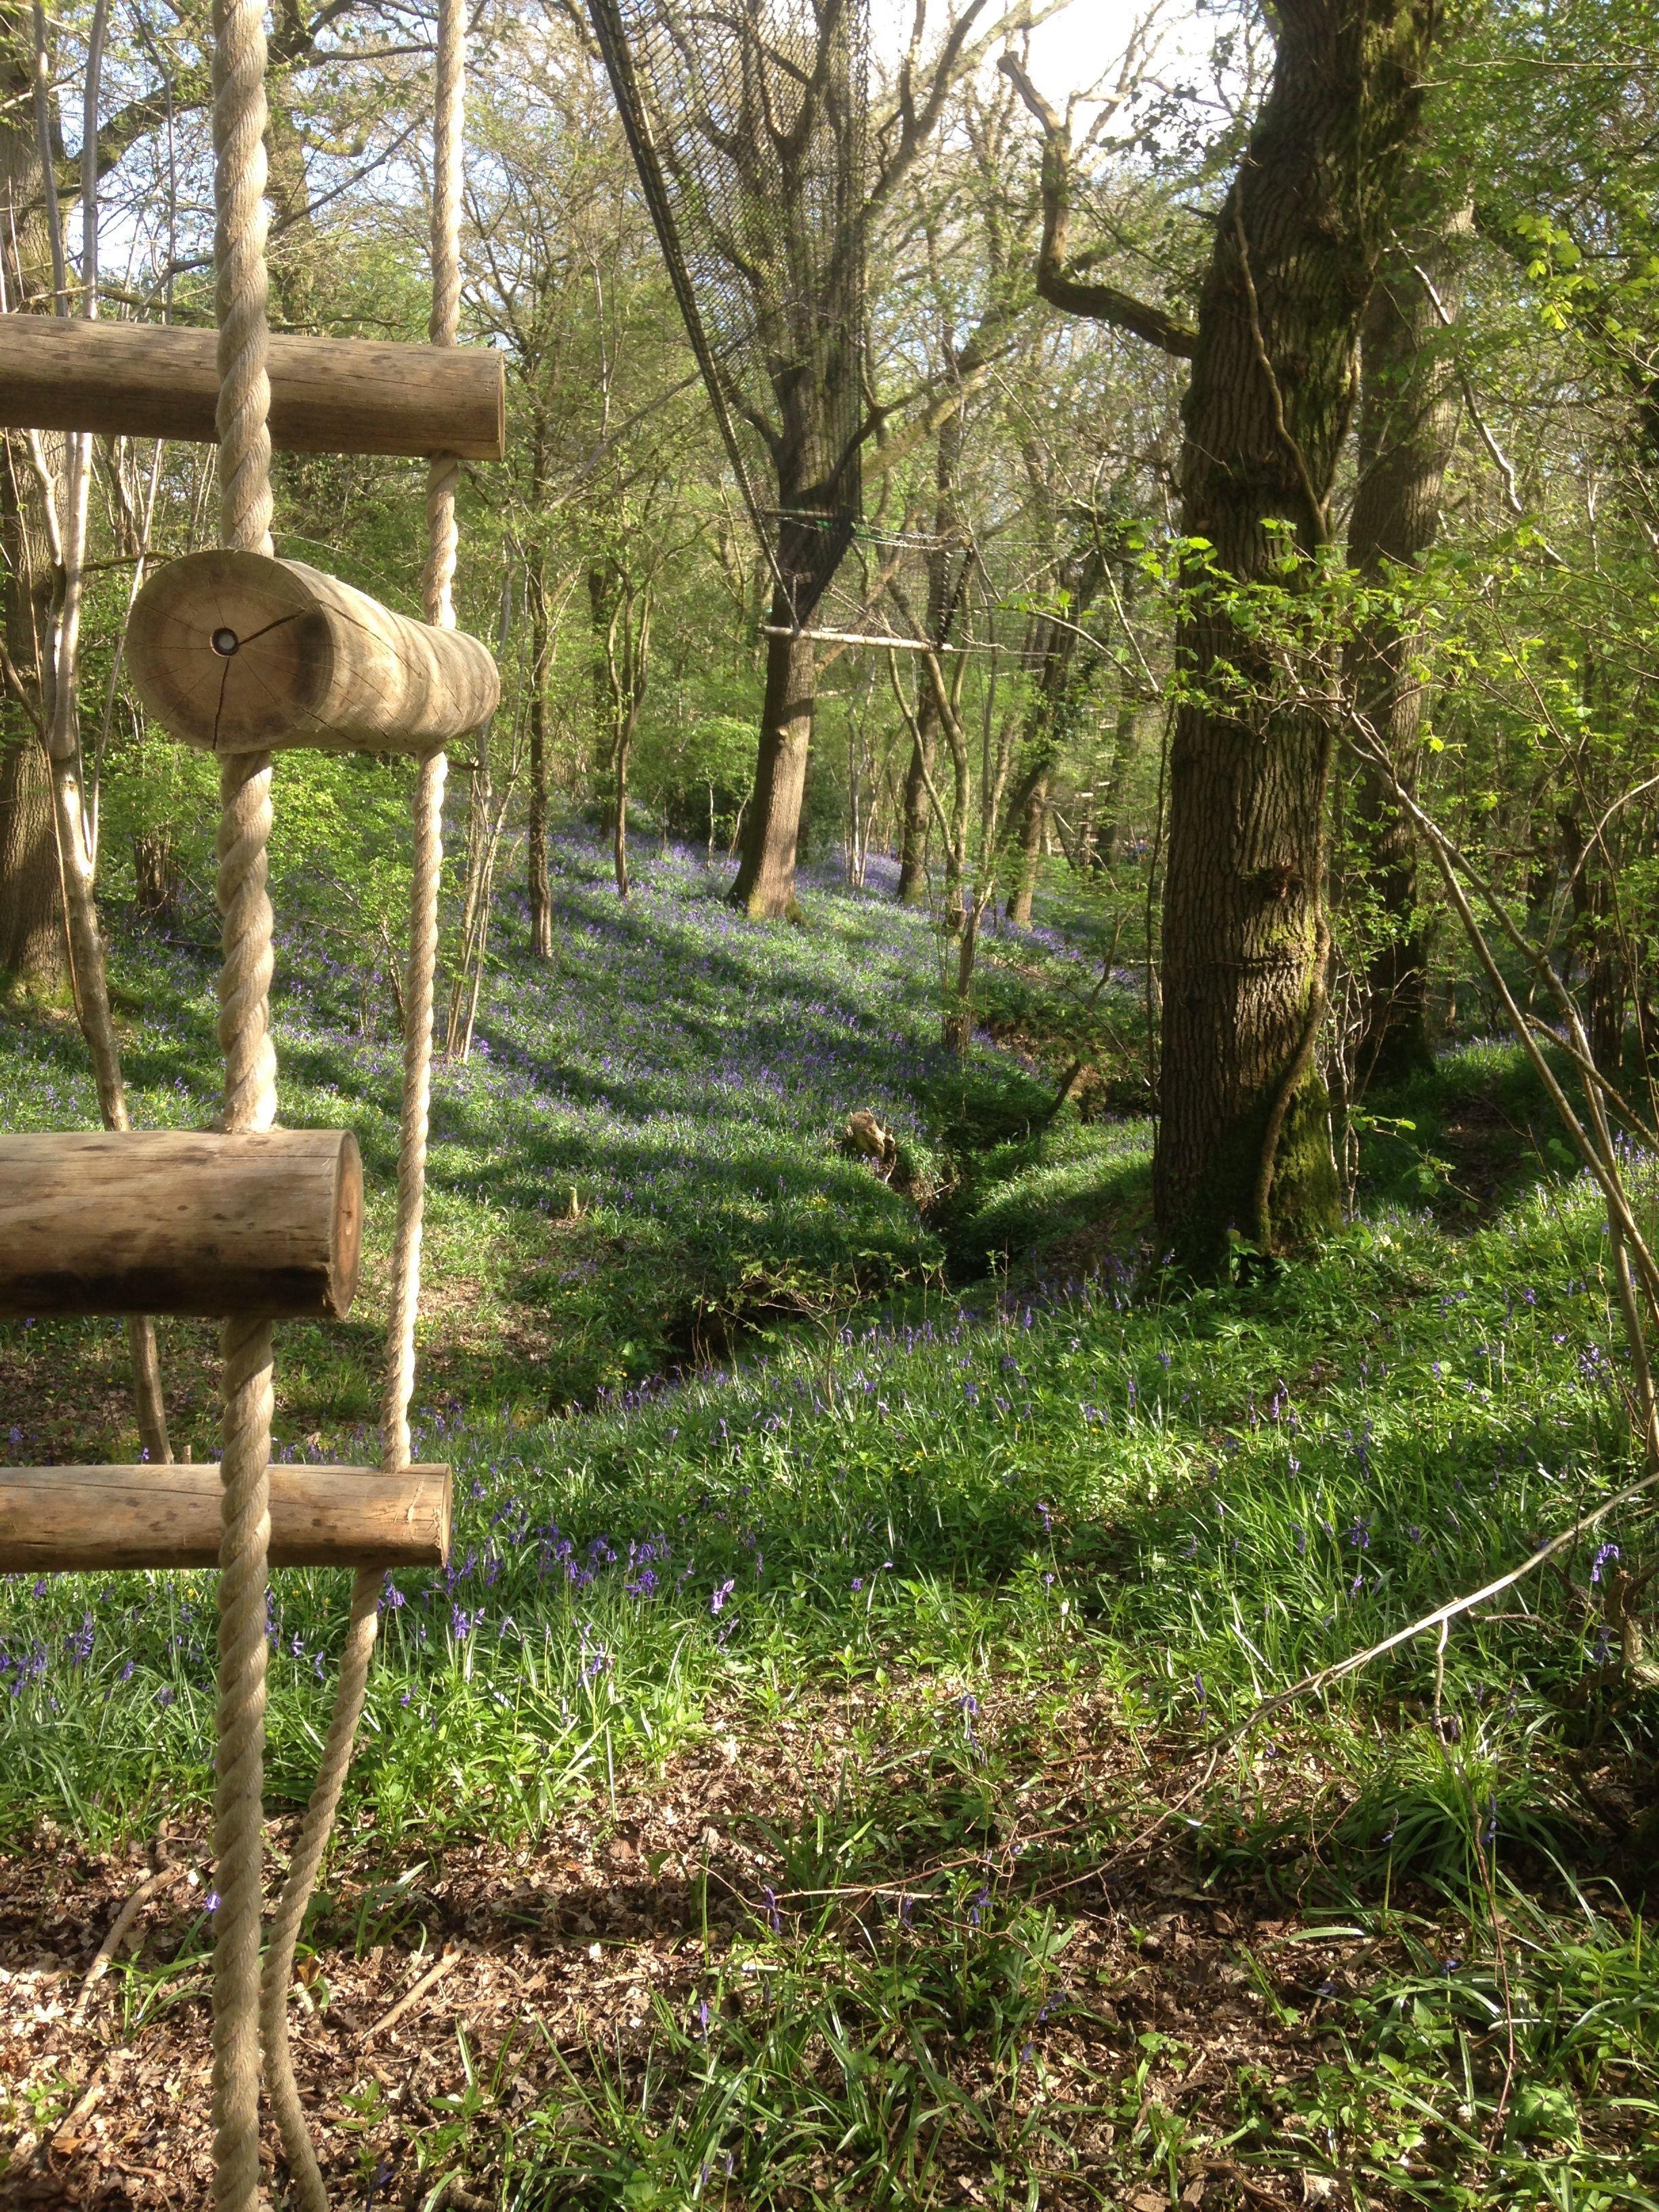 Rope ladder The adventure beginsa beautiful woodland